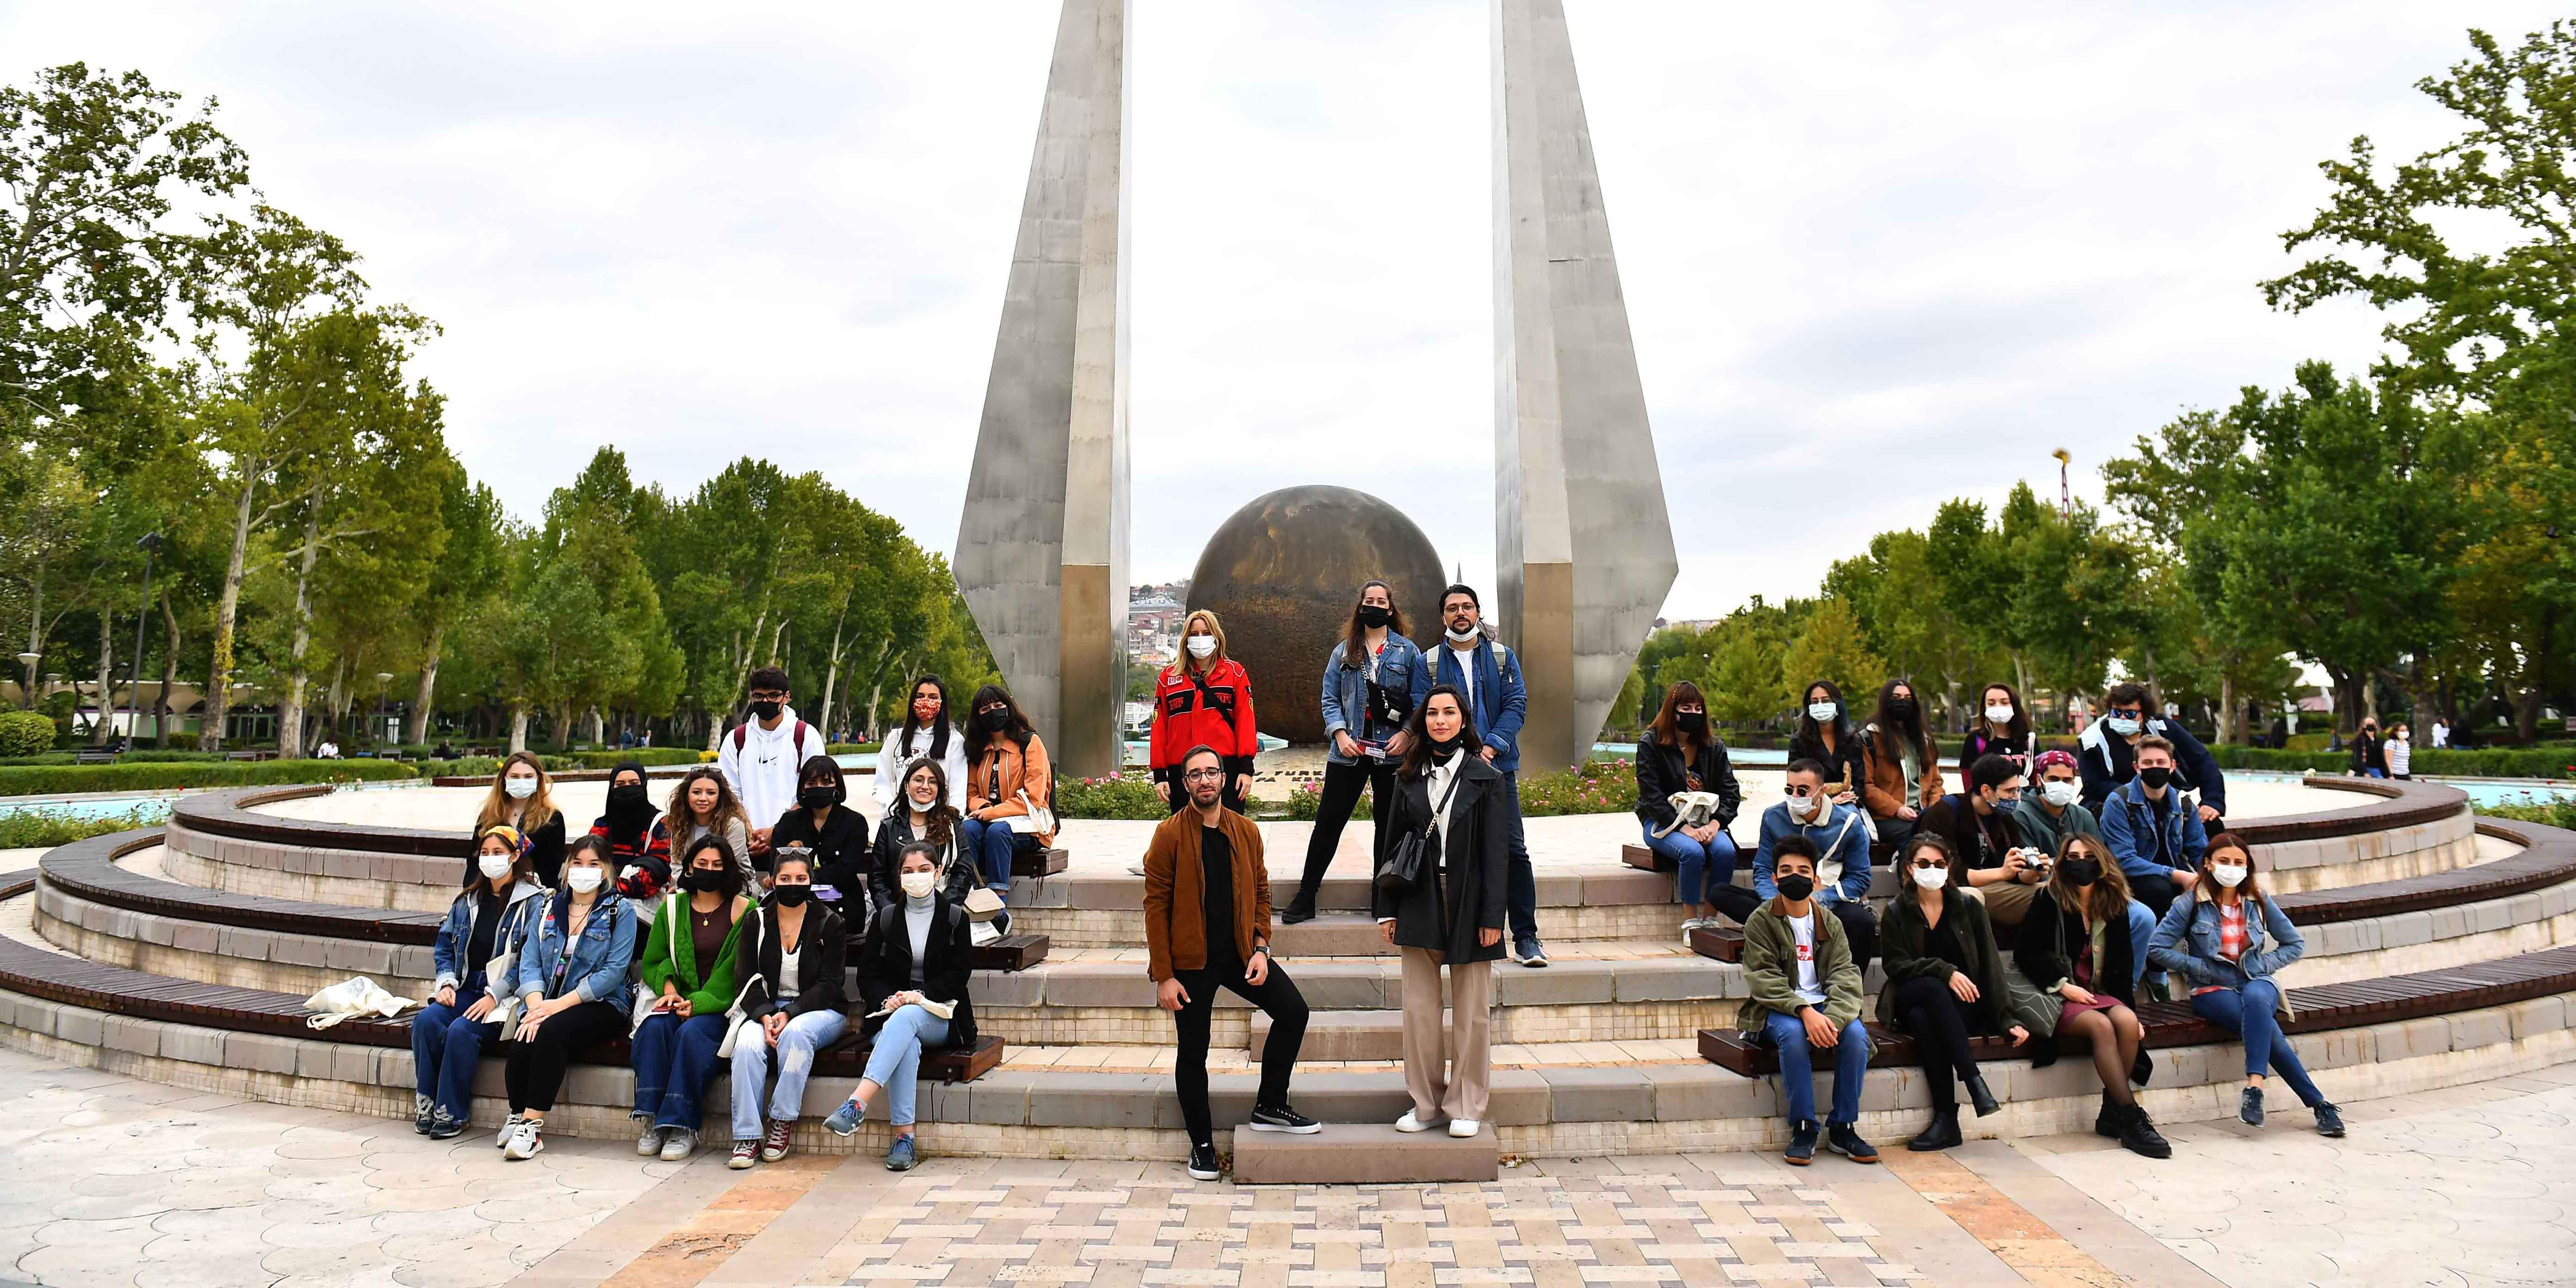 Okumaya gelen öğrencilere kent gezisi